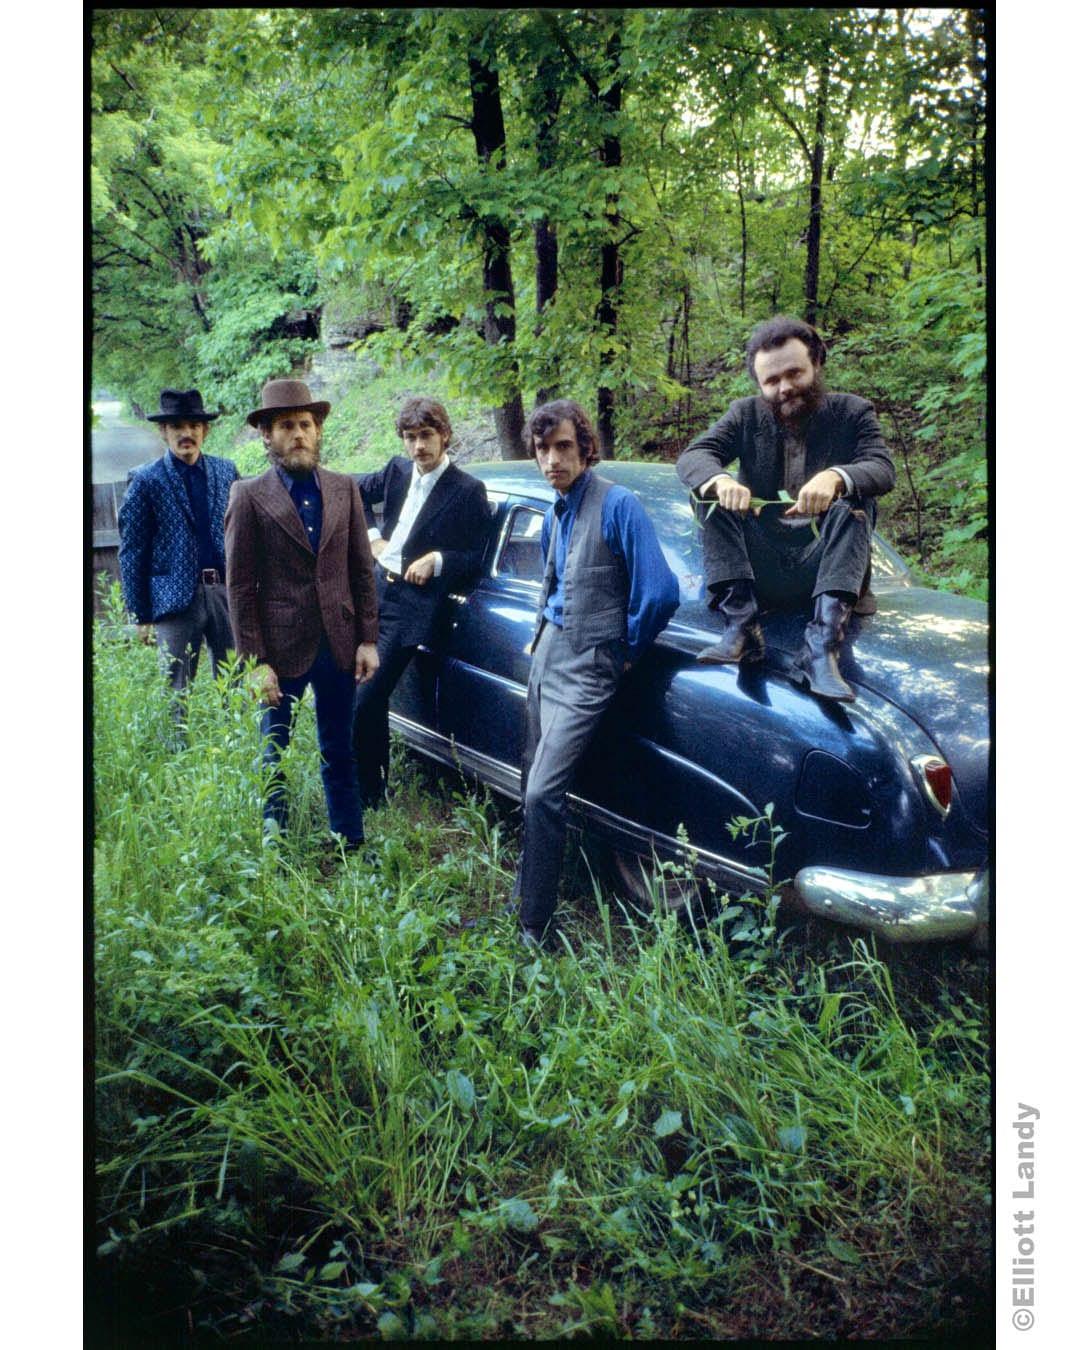 293 The Band, outside Rick Danko's Zena home, posing with his Hudson, Woodstock, NY, 1969. Rick Danko, Levon Helm, Robbie Robertson, Richard Manuel, Garth Hudson